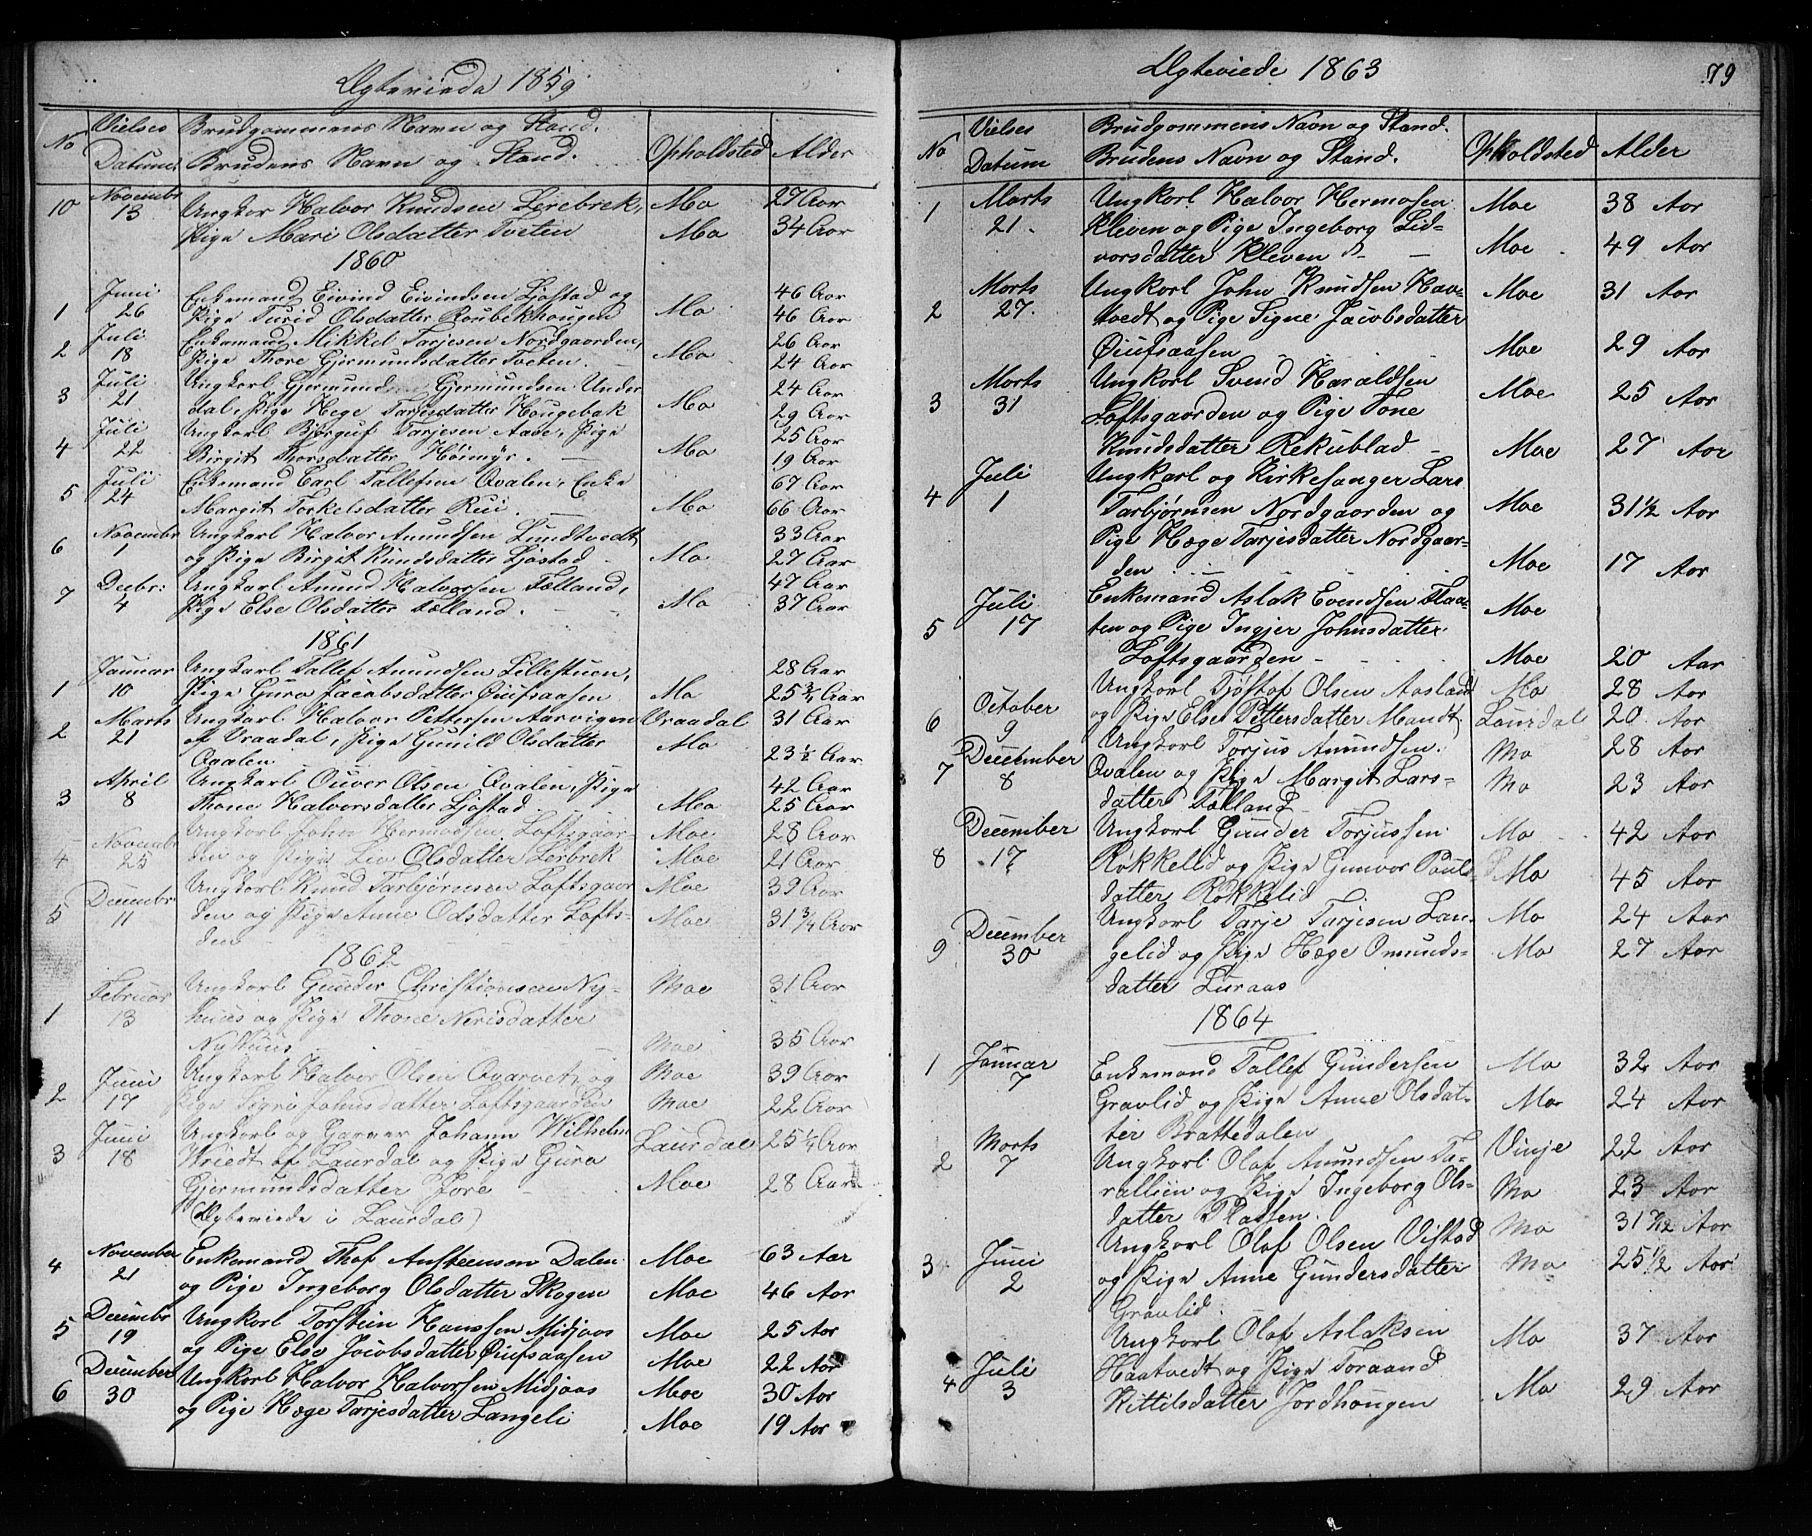 SAKO, Mo kirkebøker, G/Ga/L0001: Klokkerbok nr. I 1, 1851-1891, s. 79